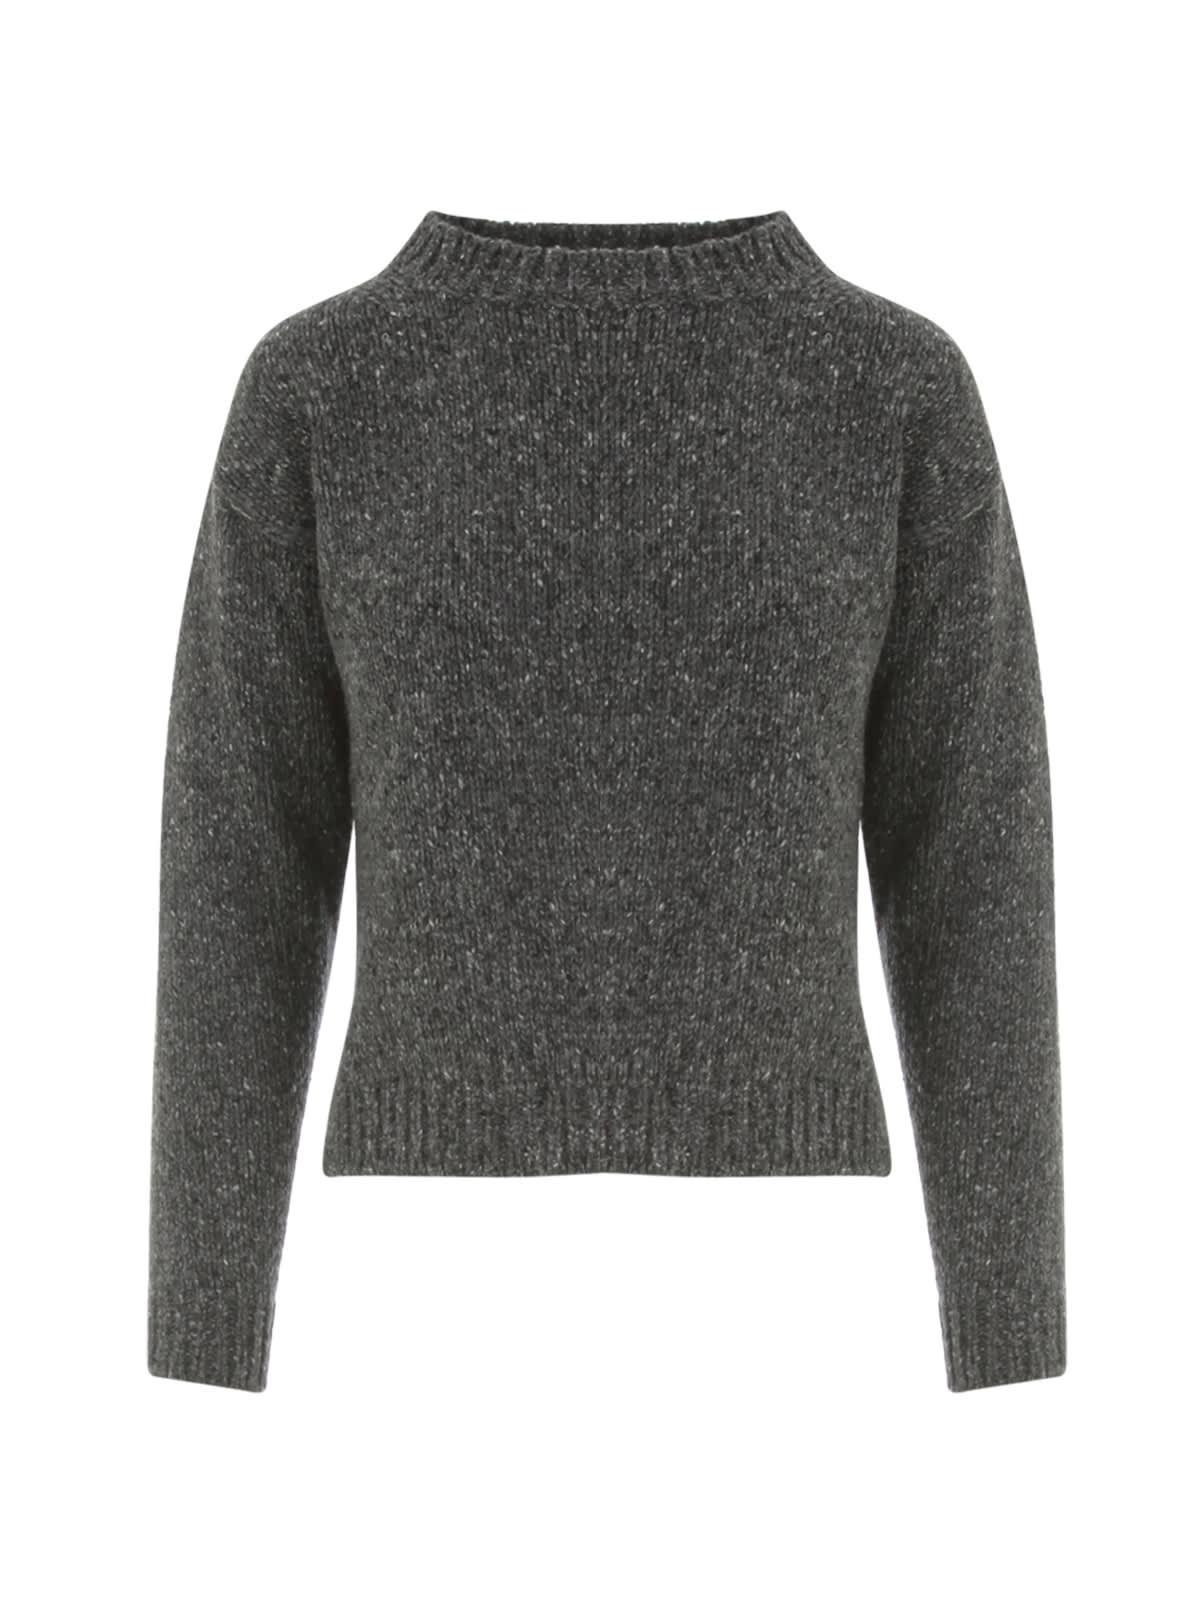 Short Crew Neck Sweater